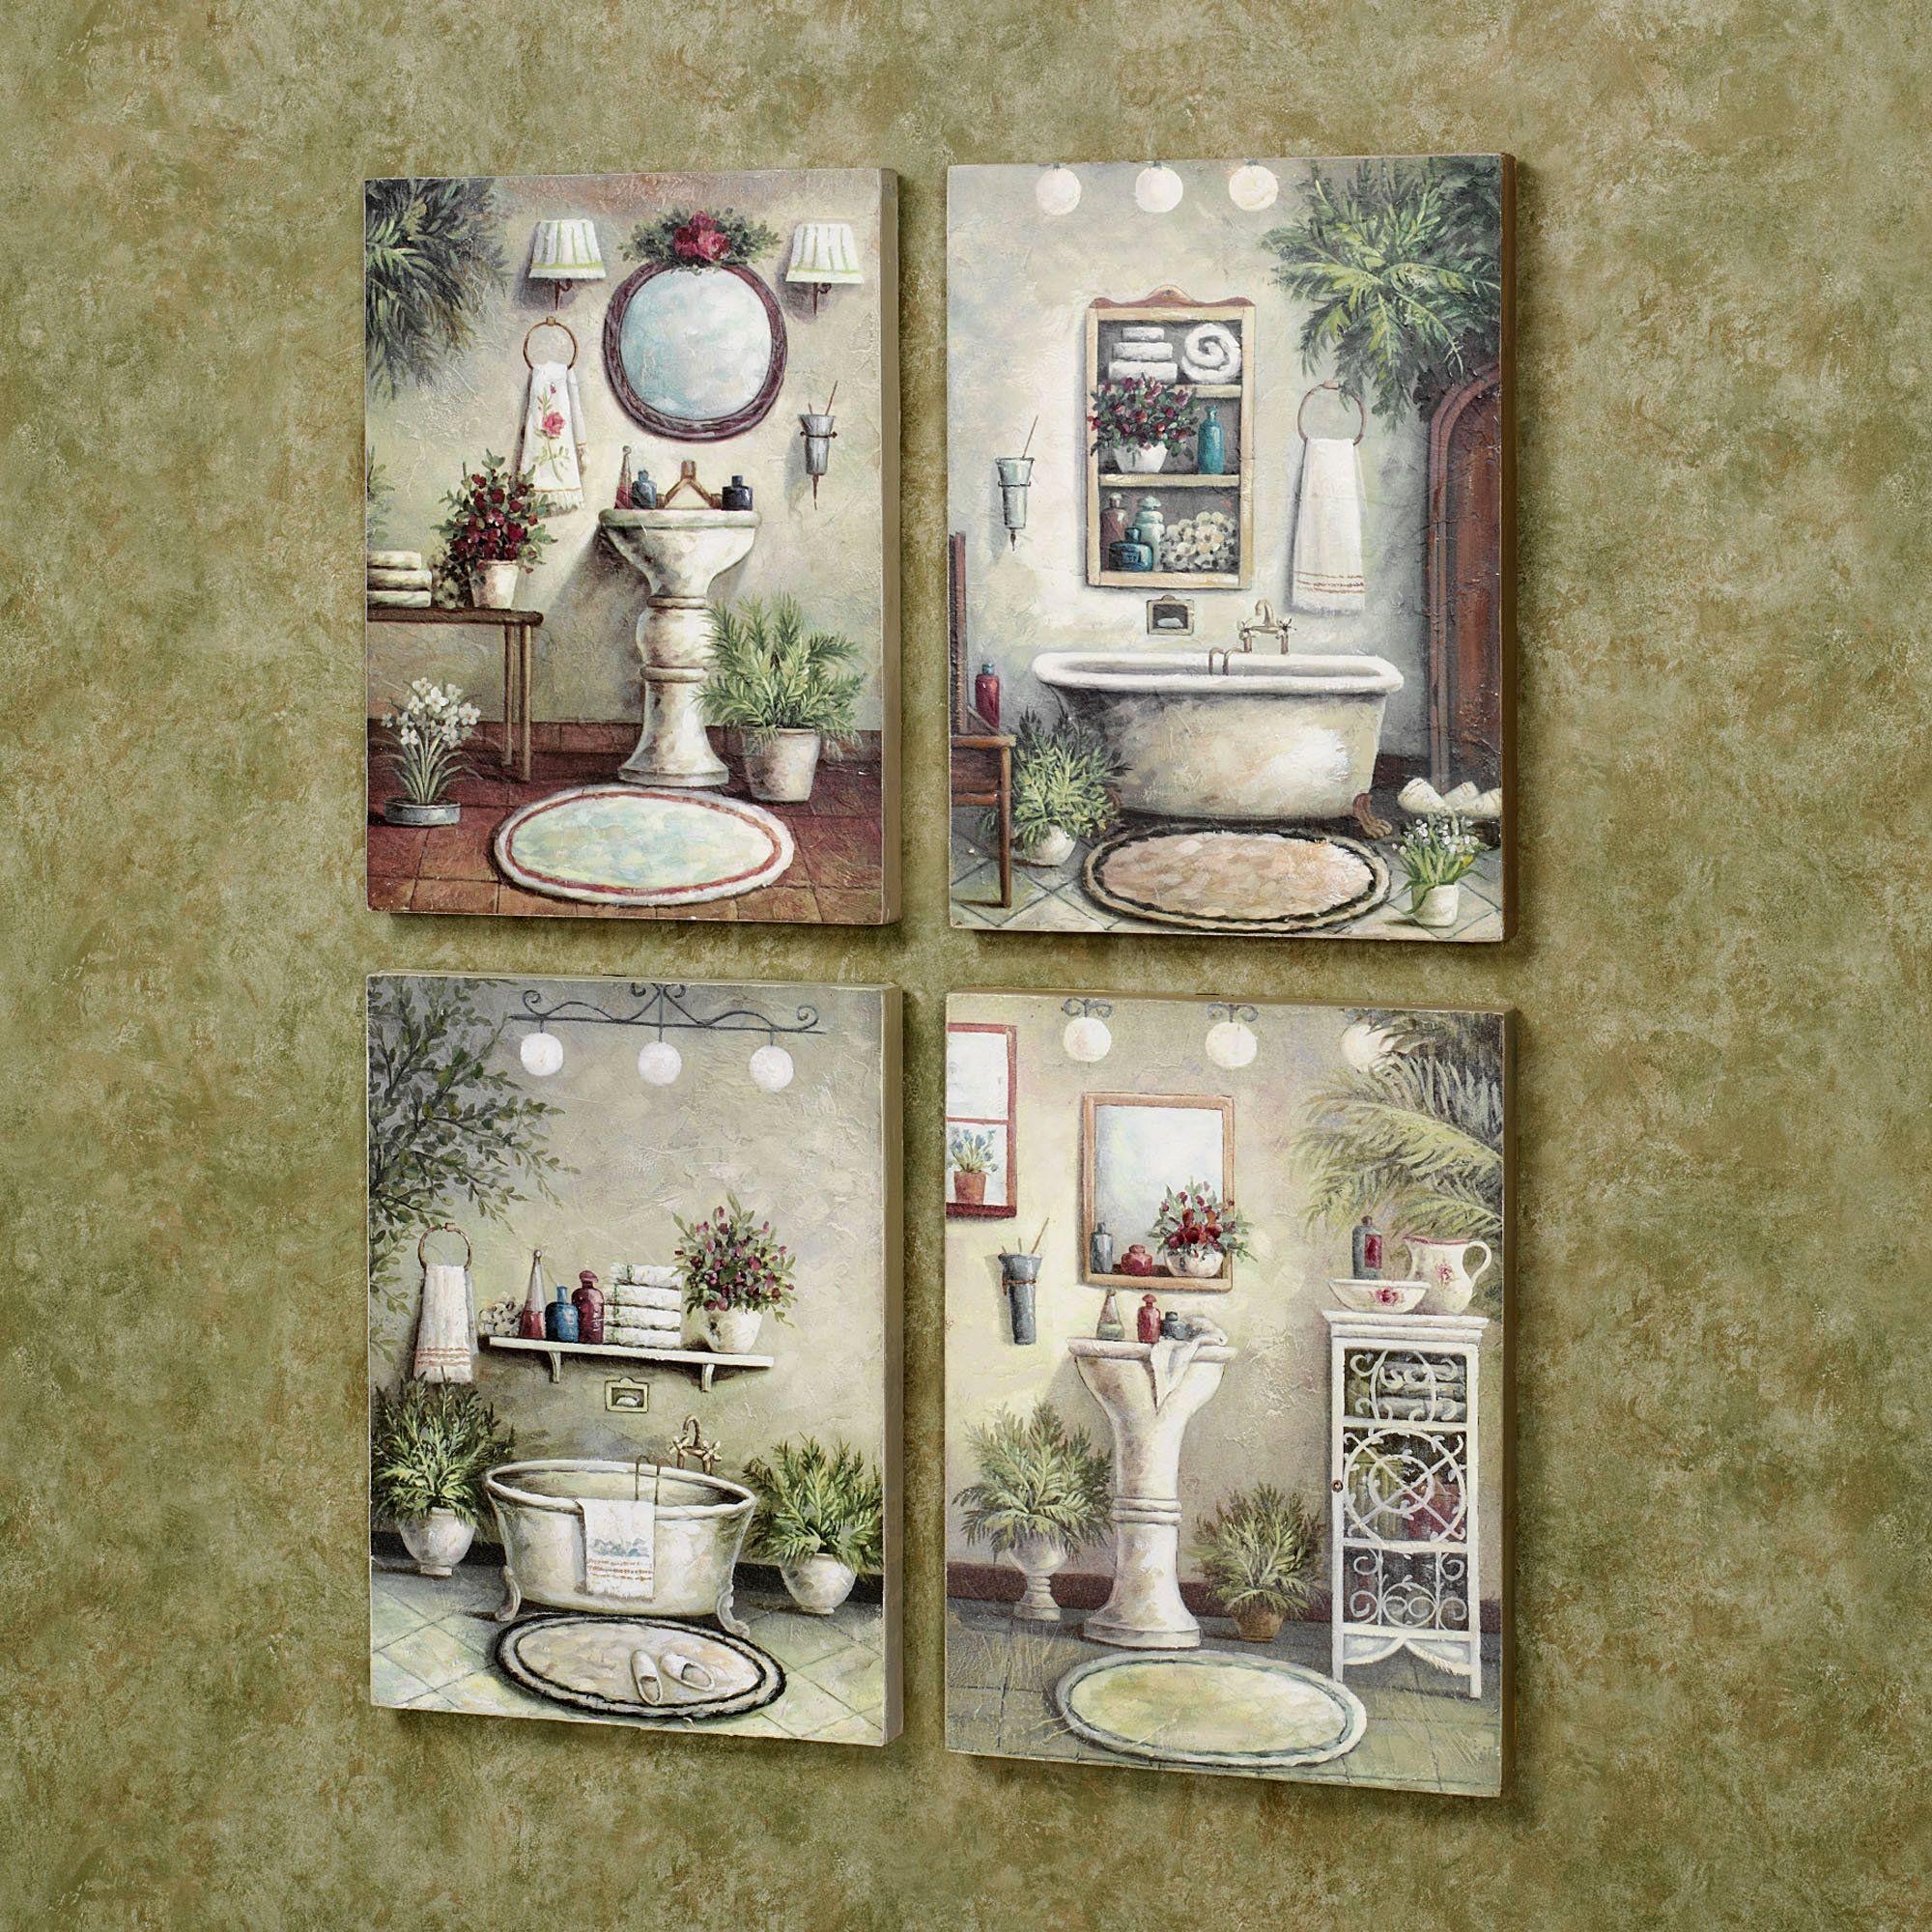 terrific bathroom art ideas model-Beautiful Bathroom Art Ideas Concept